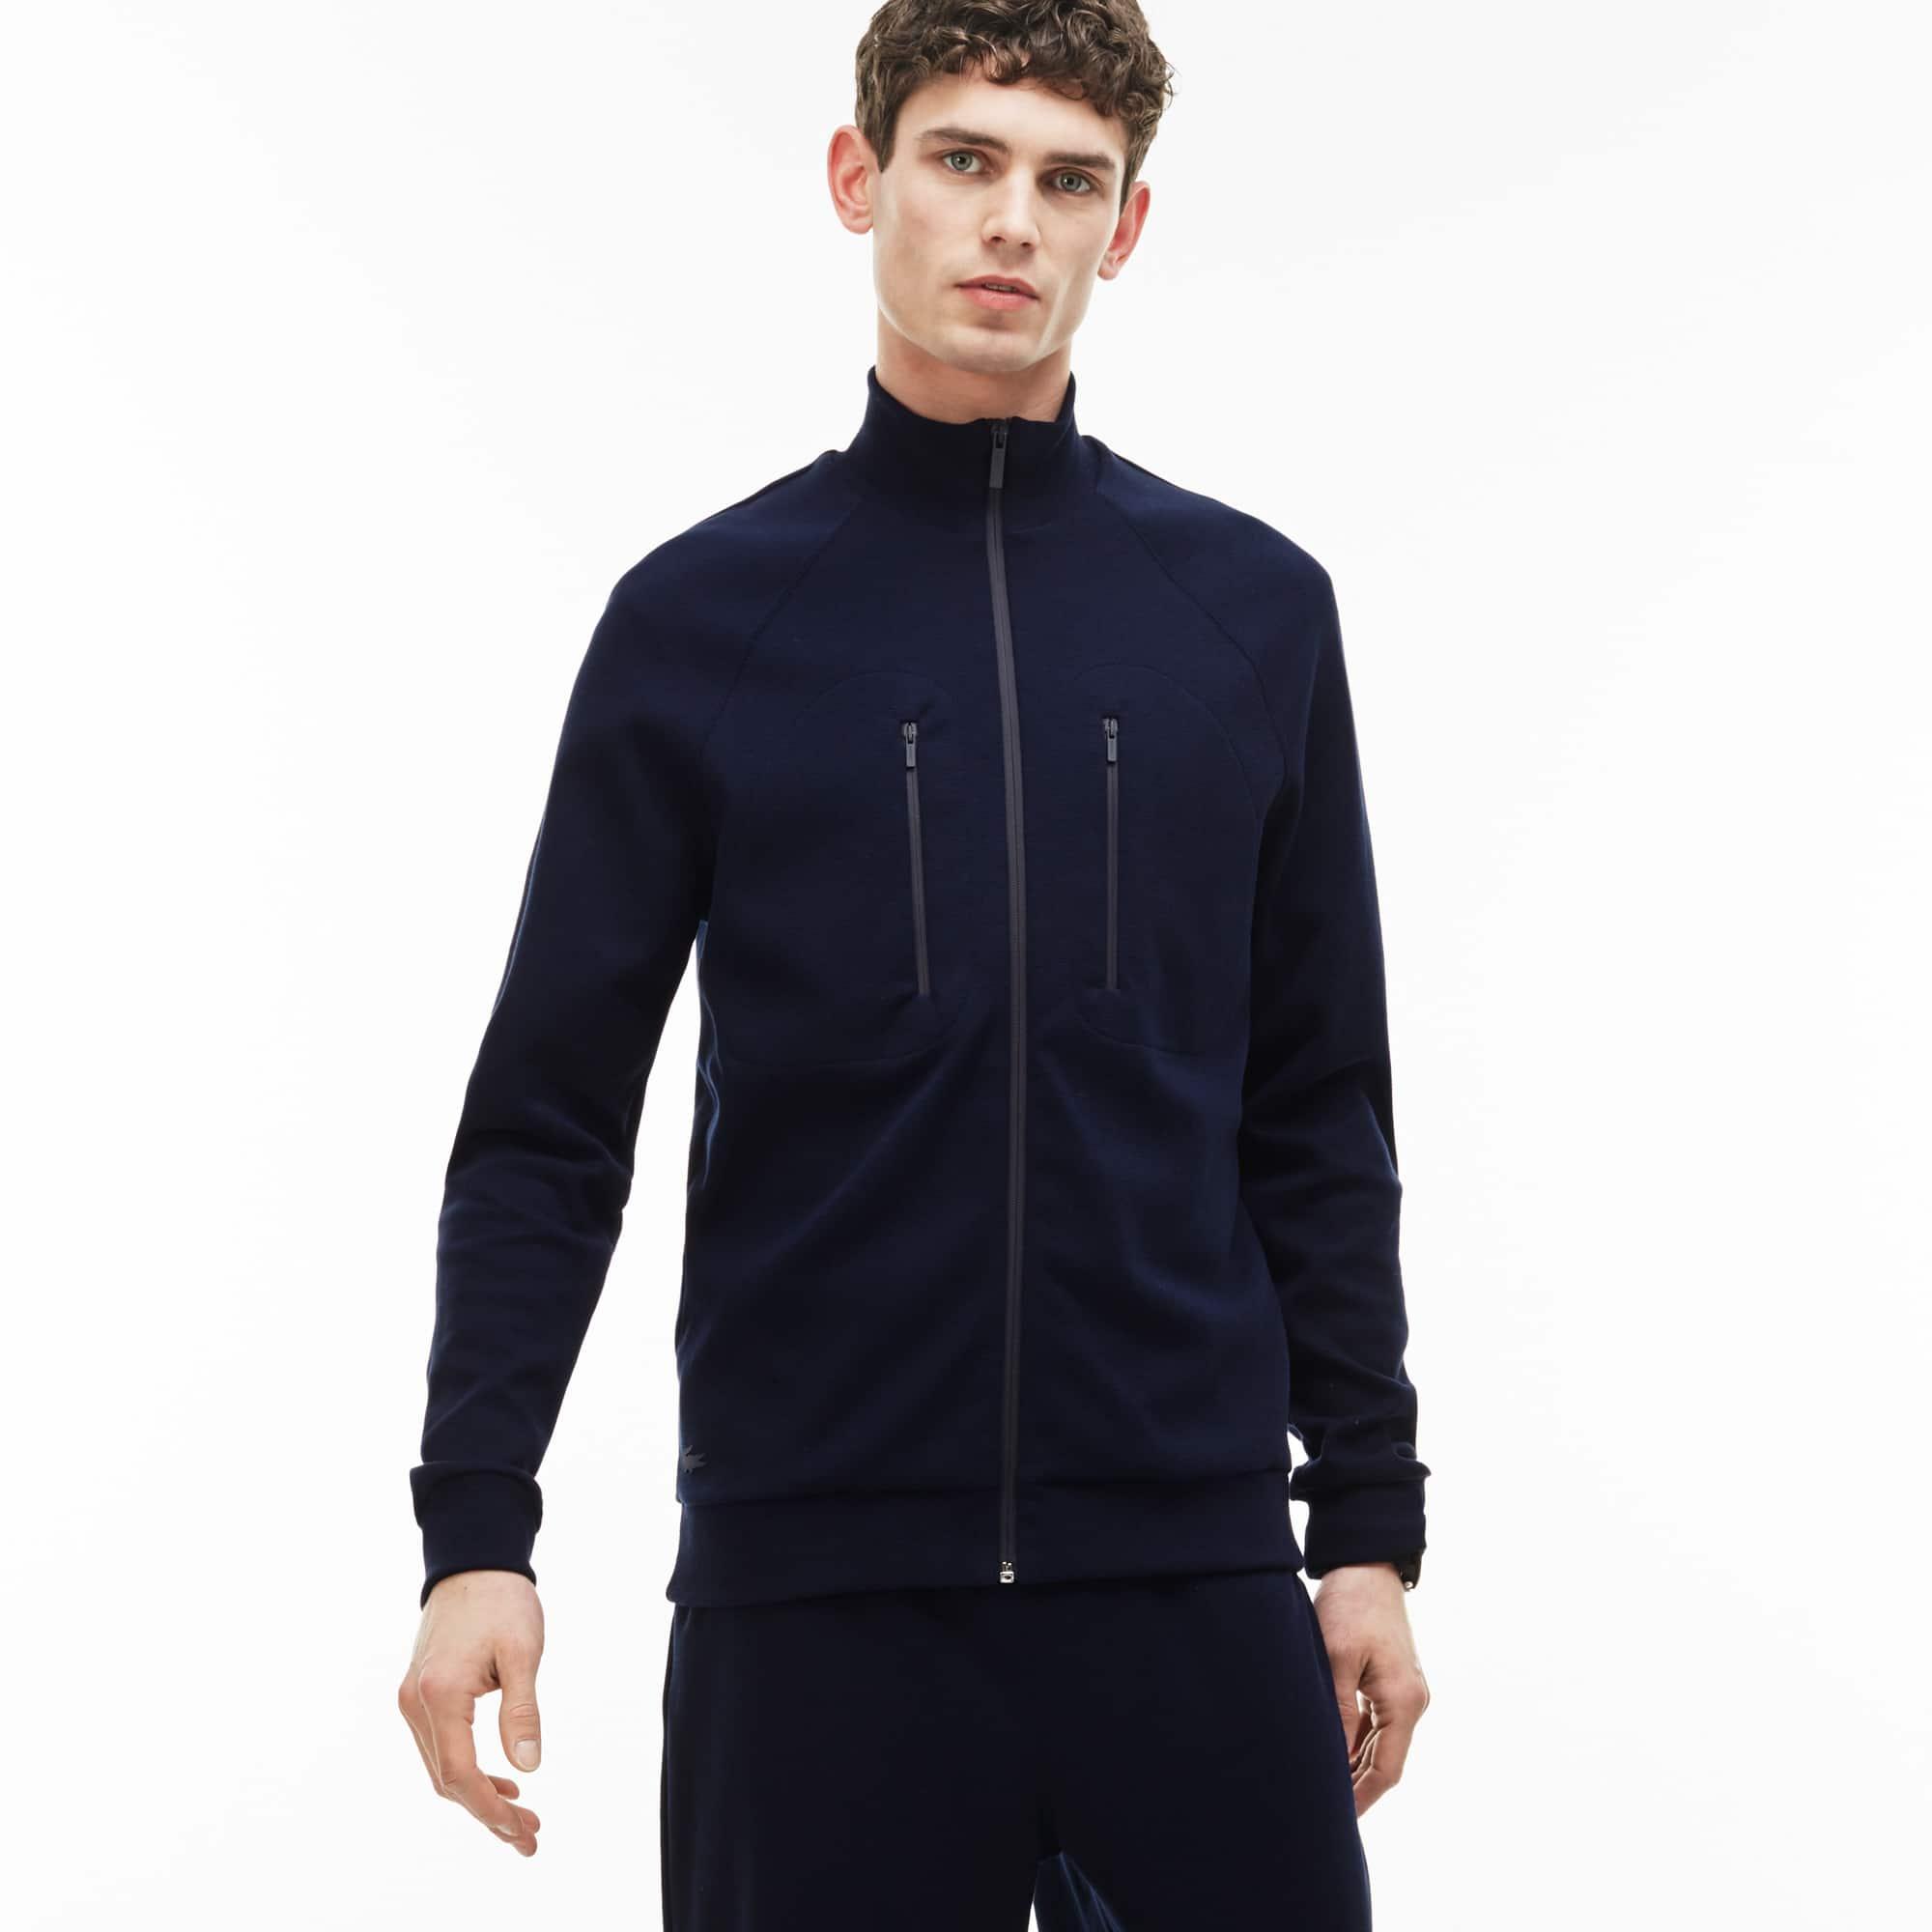 Men's Zip Stand-Up Collar Cotton Milano Knit Sweatshirt